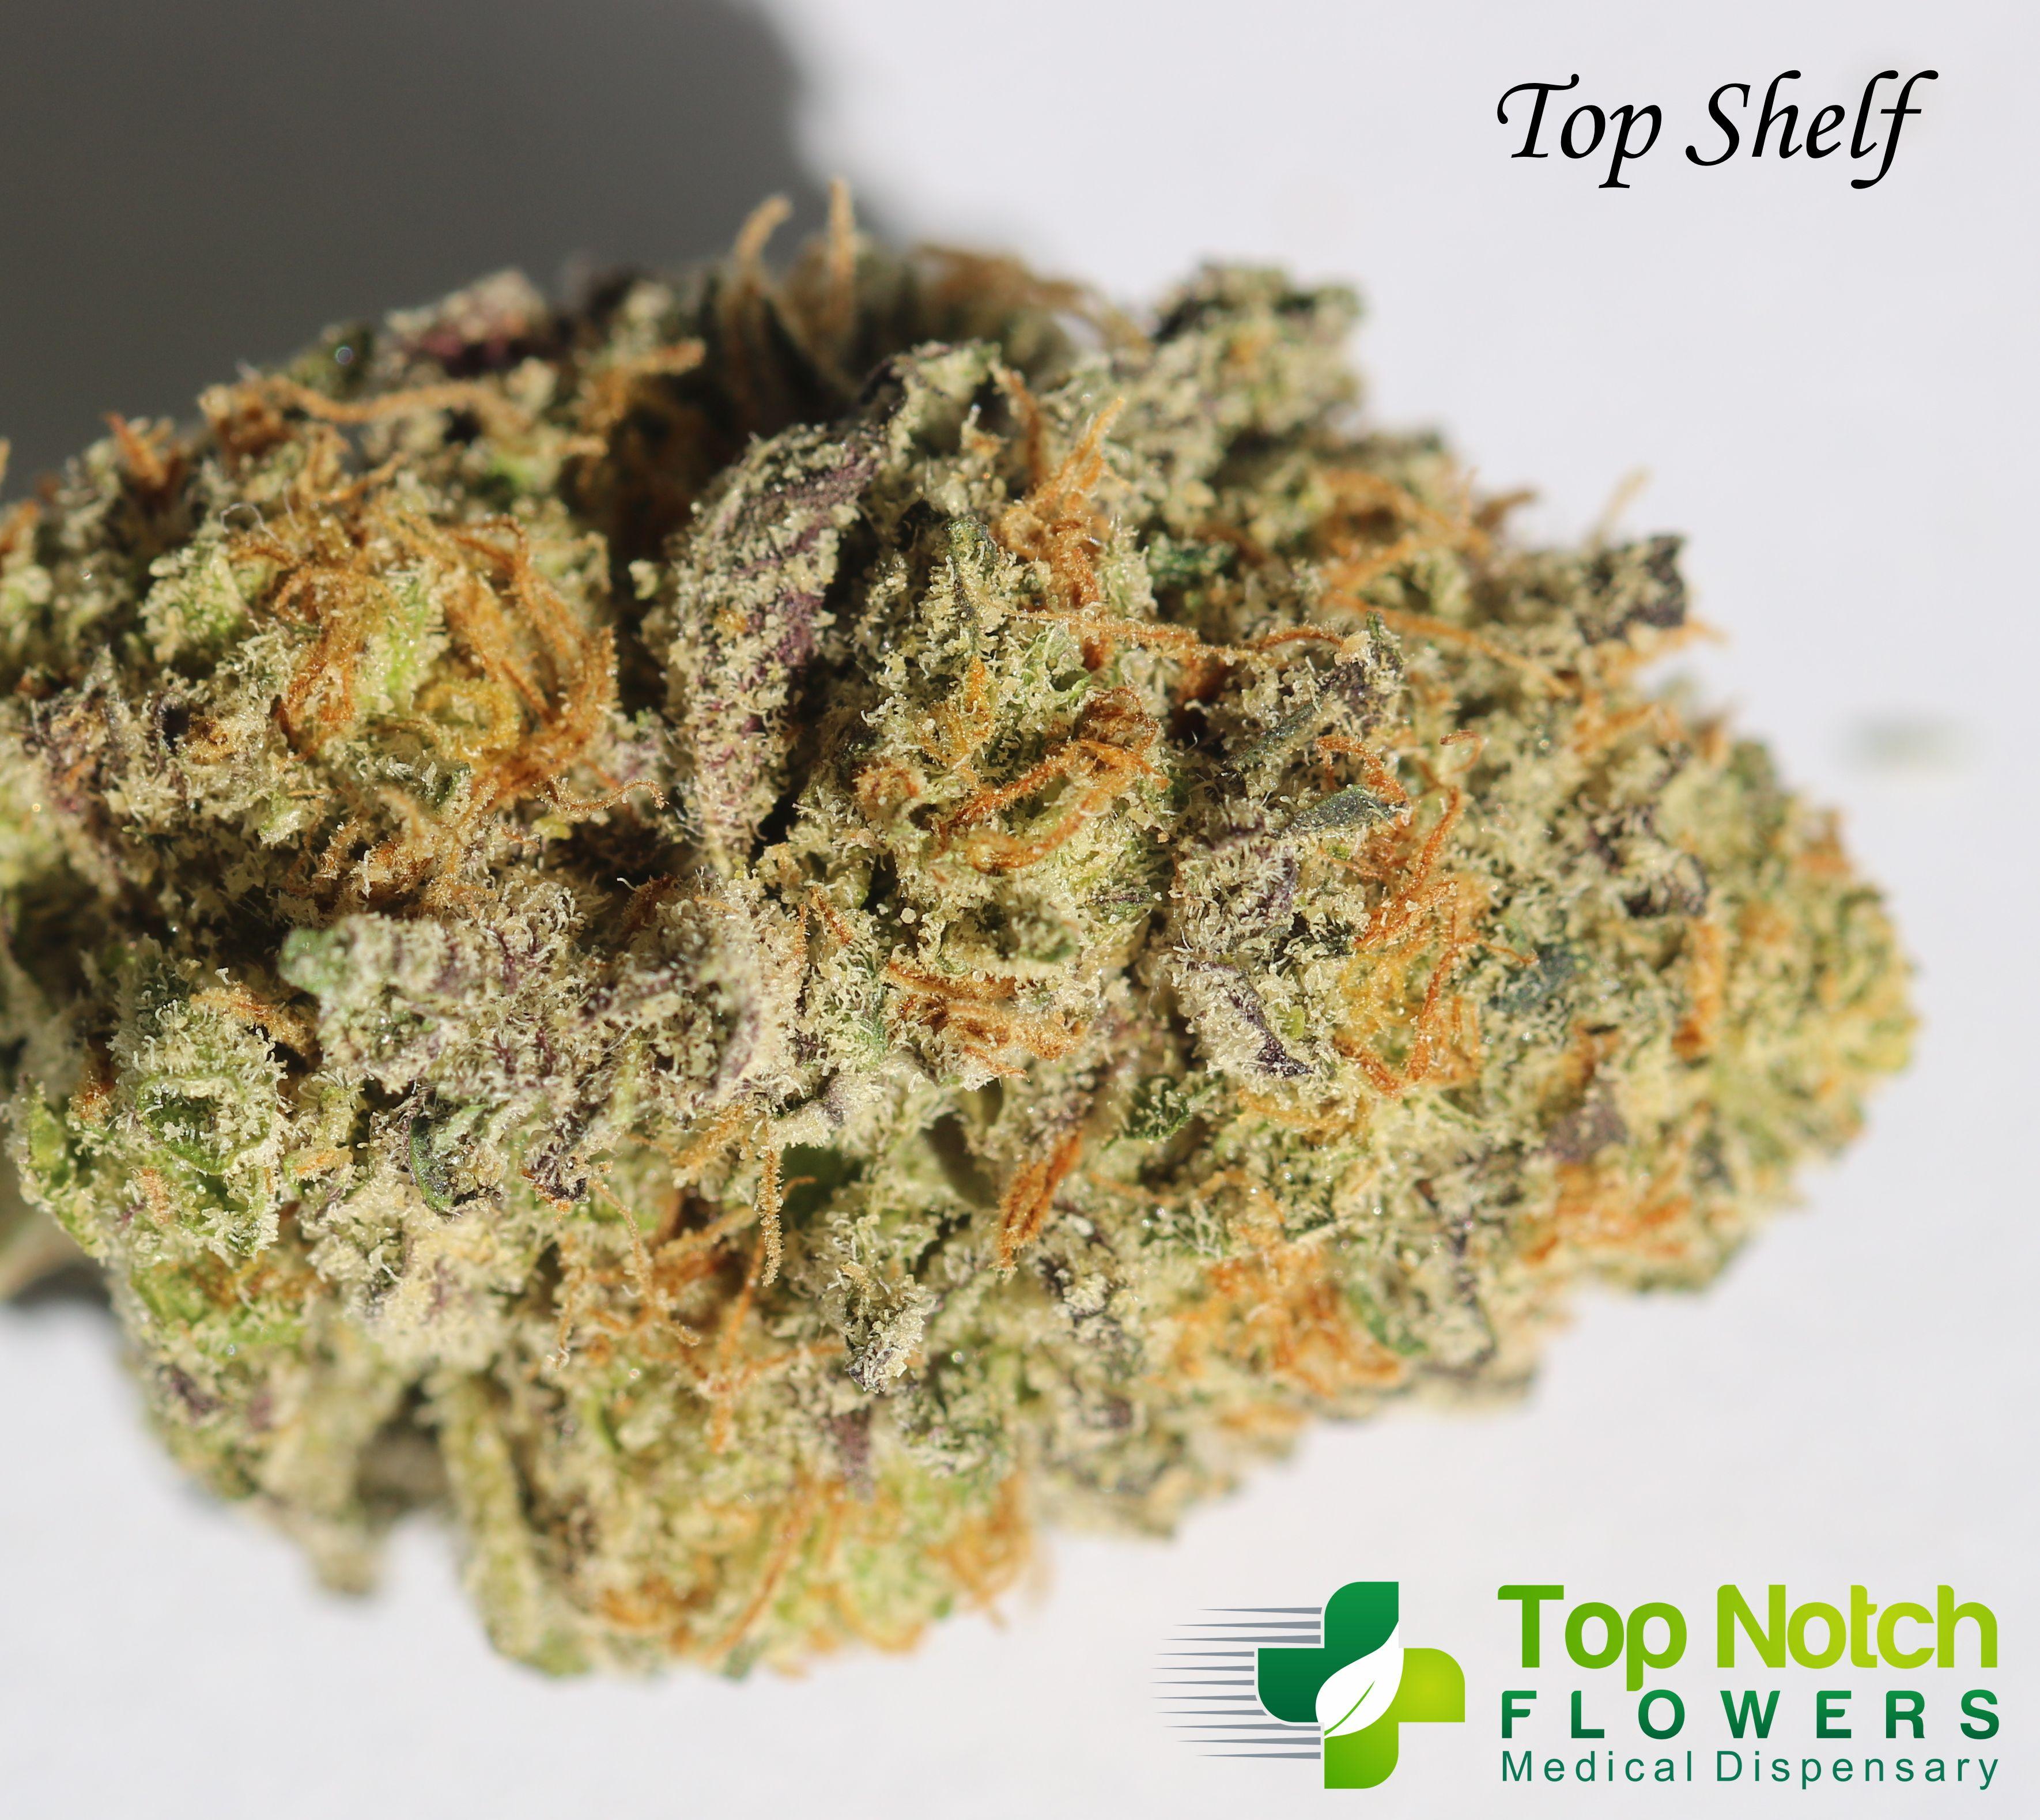 Top Shelf Cherry Bubba